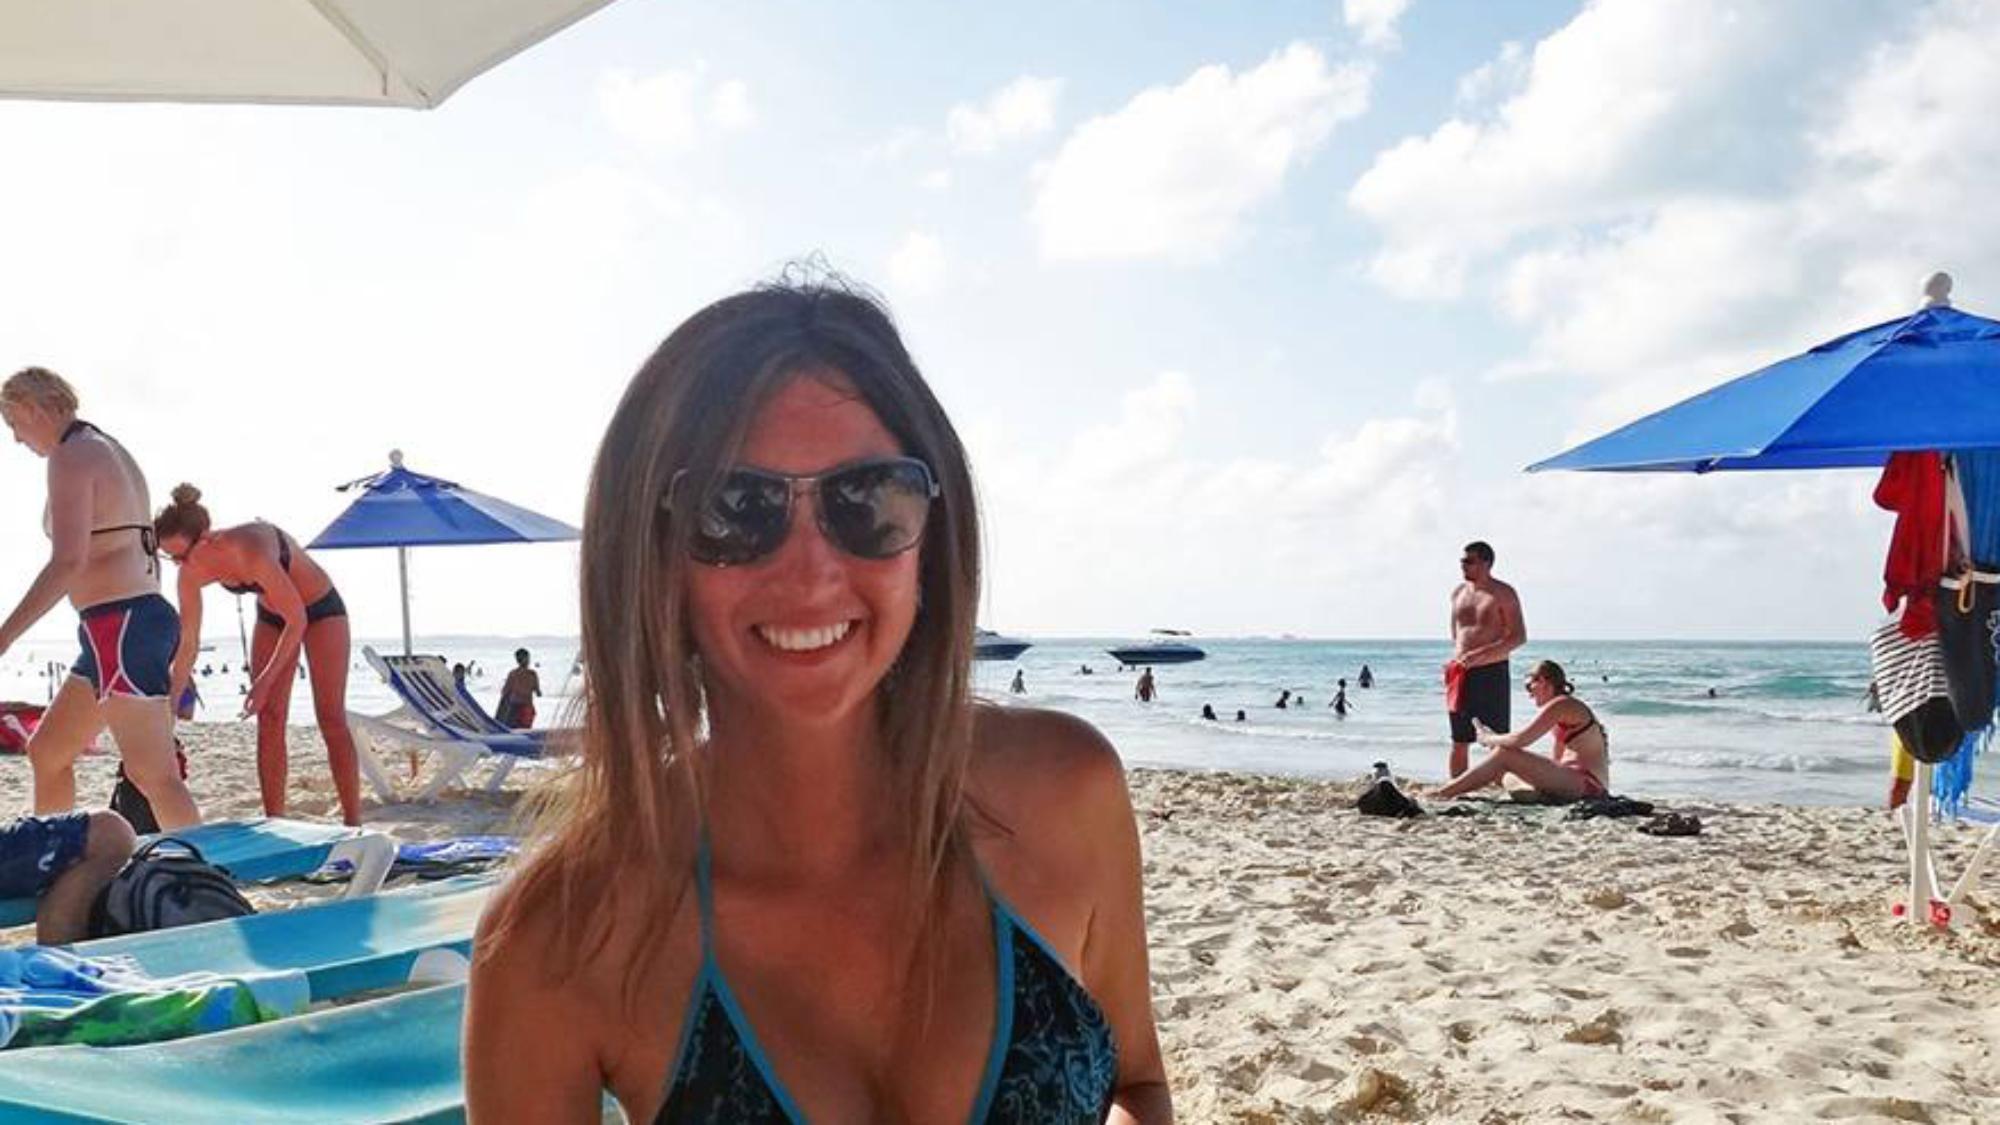 Jessica at Playa Norte, Isla Mujeres, Mexico